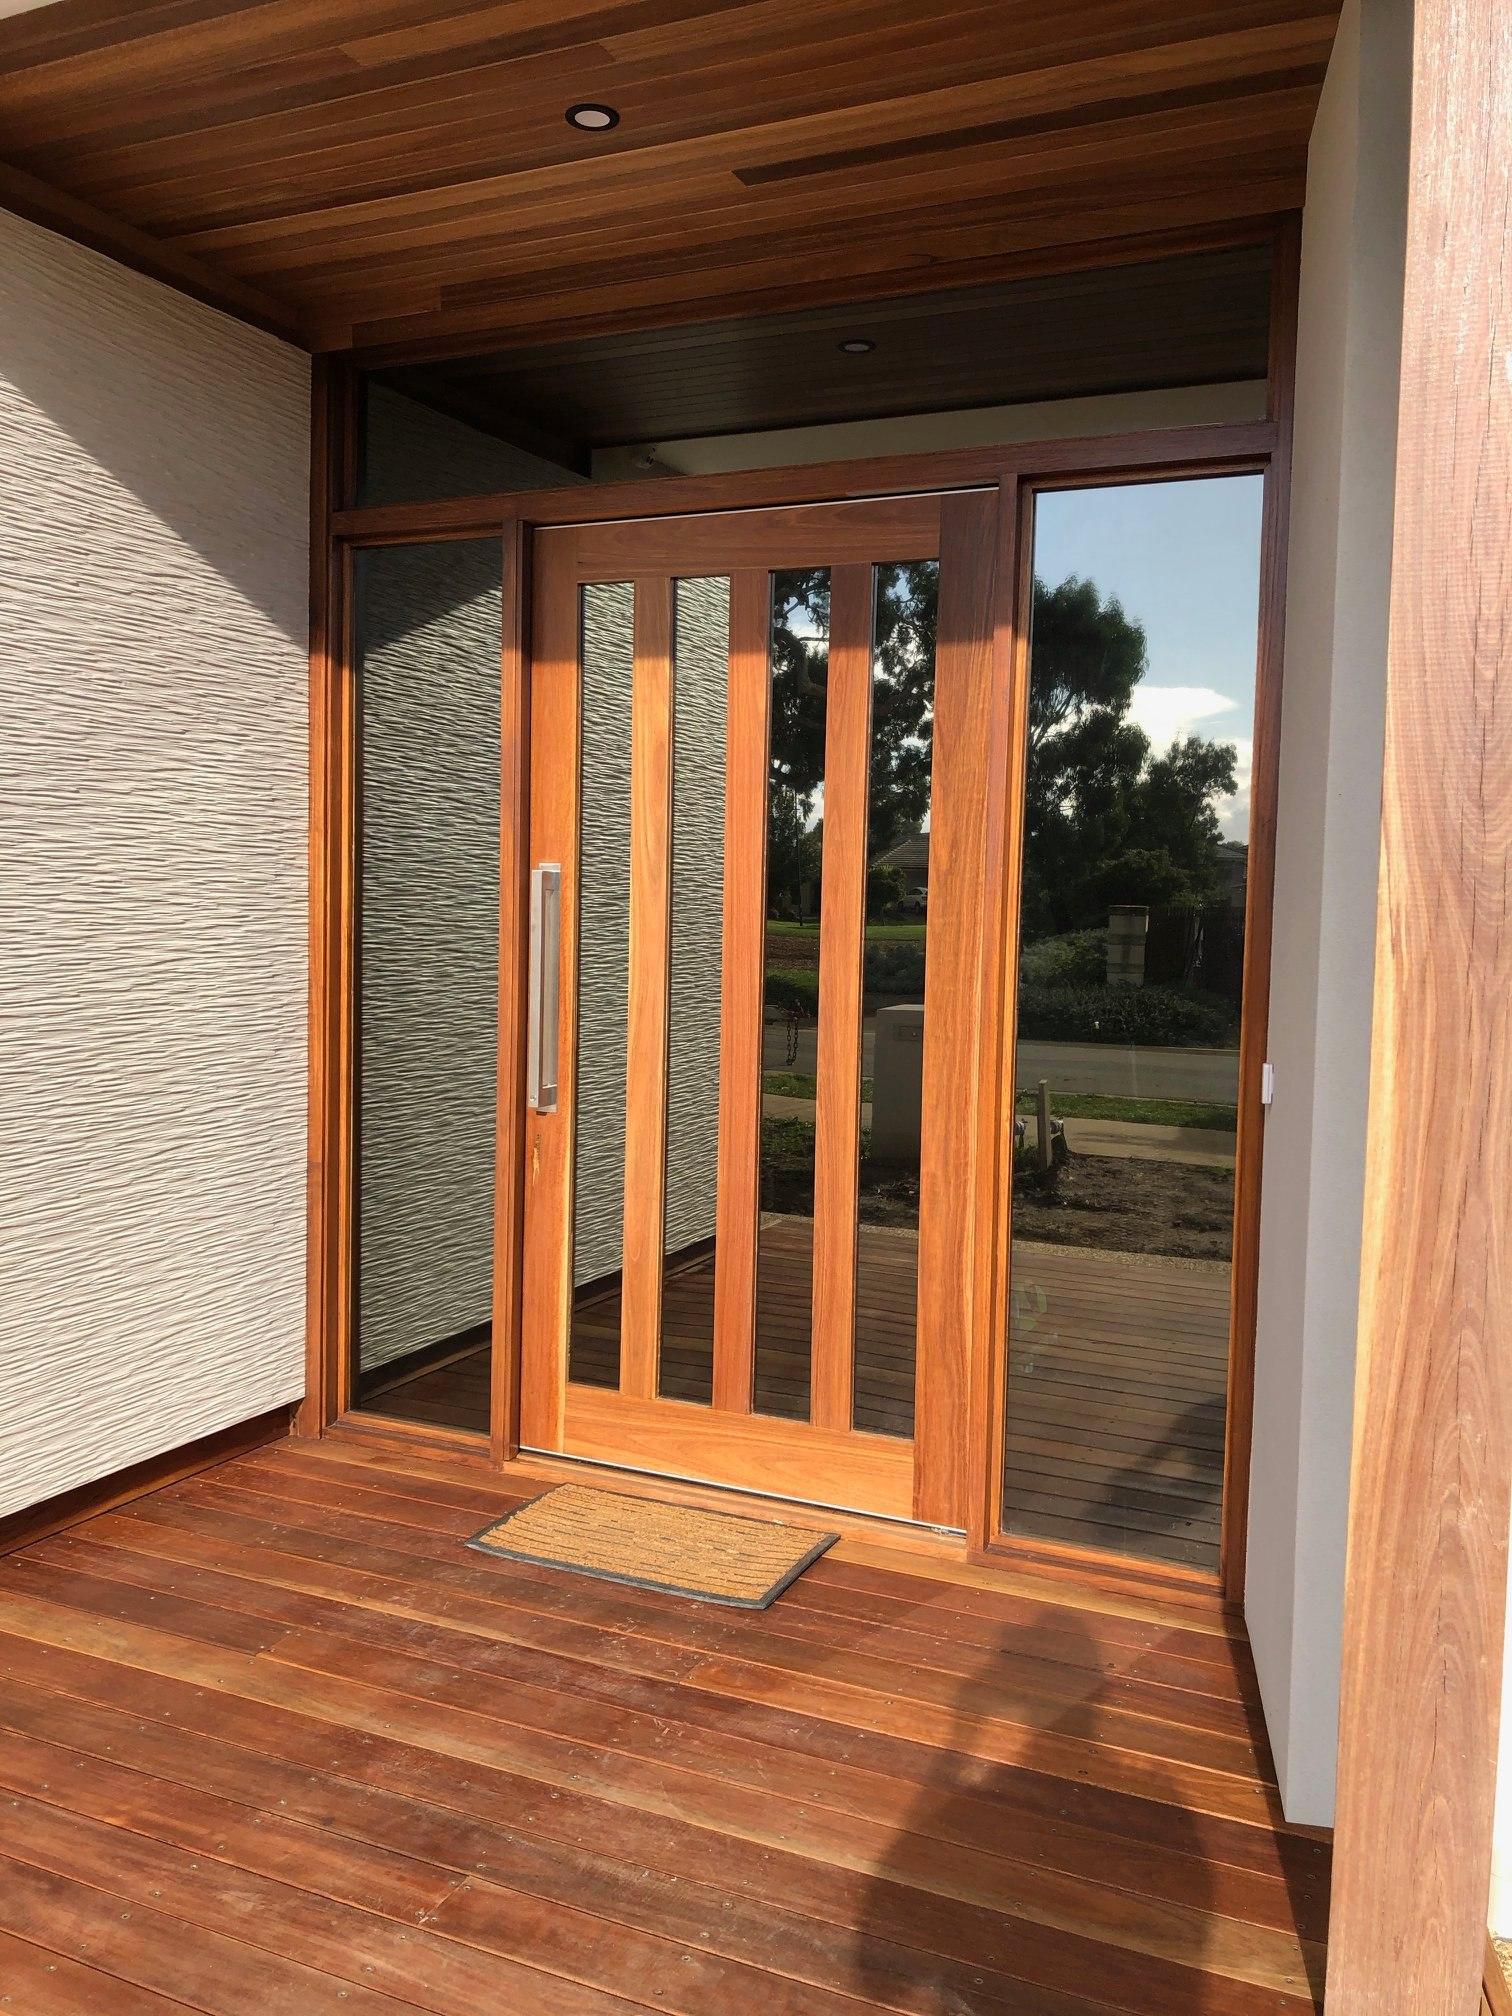 Reduce heat by Windows tinting